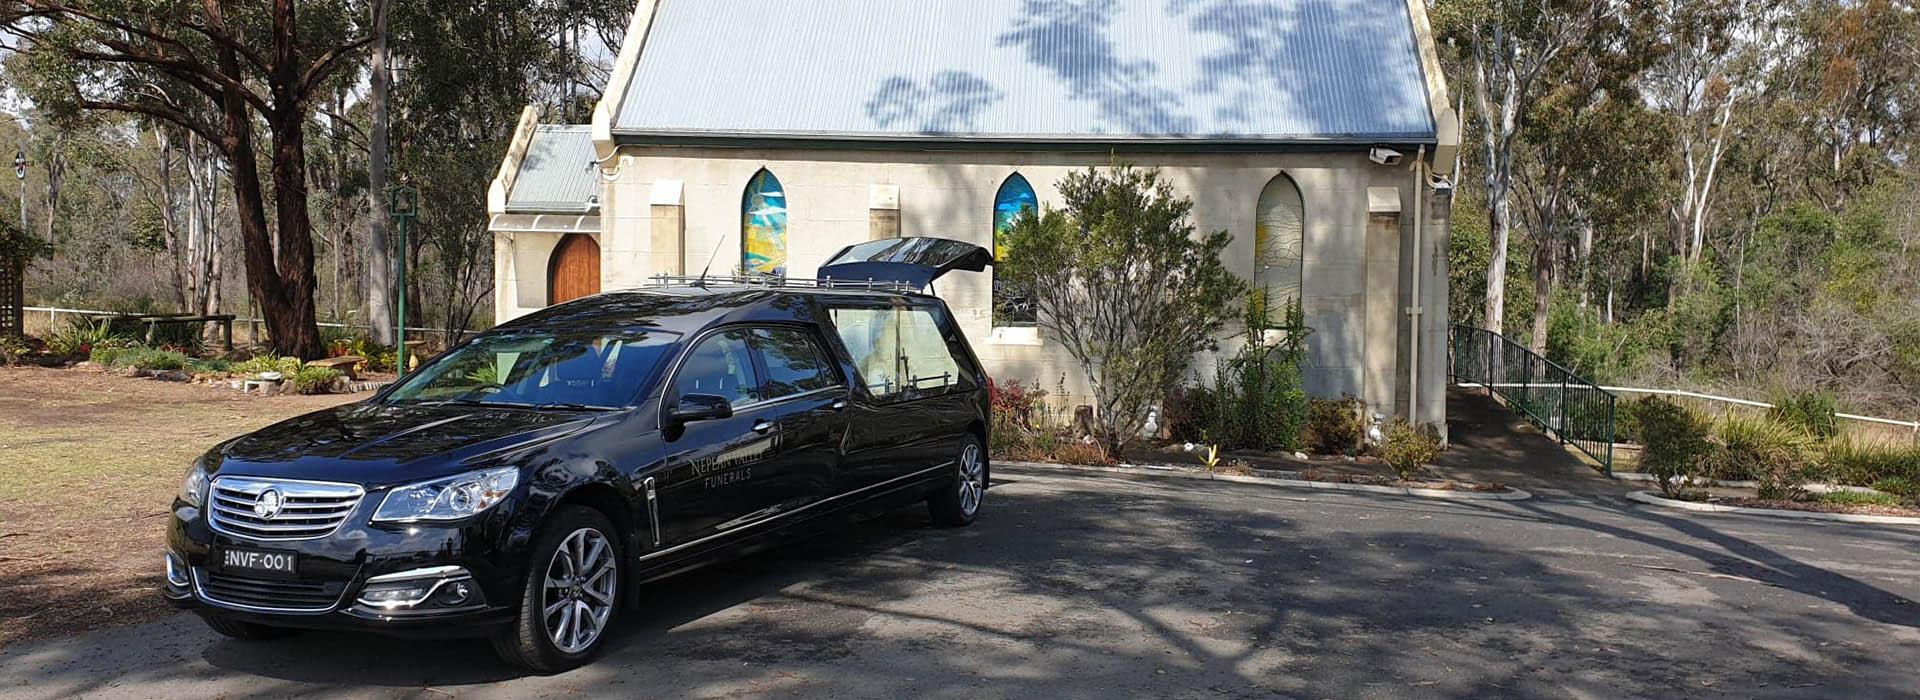 Funeral Directors Luddenham